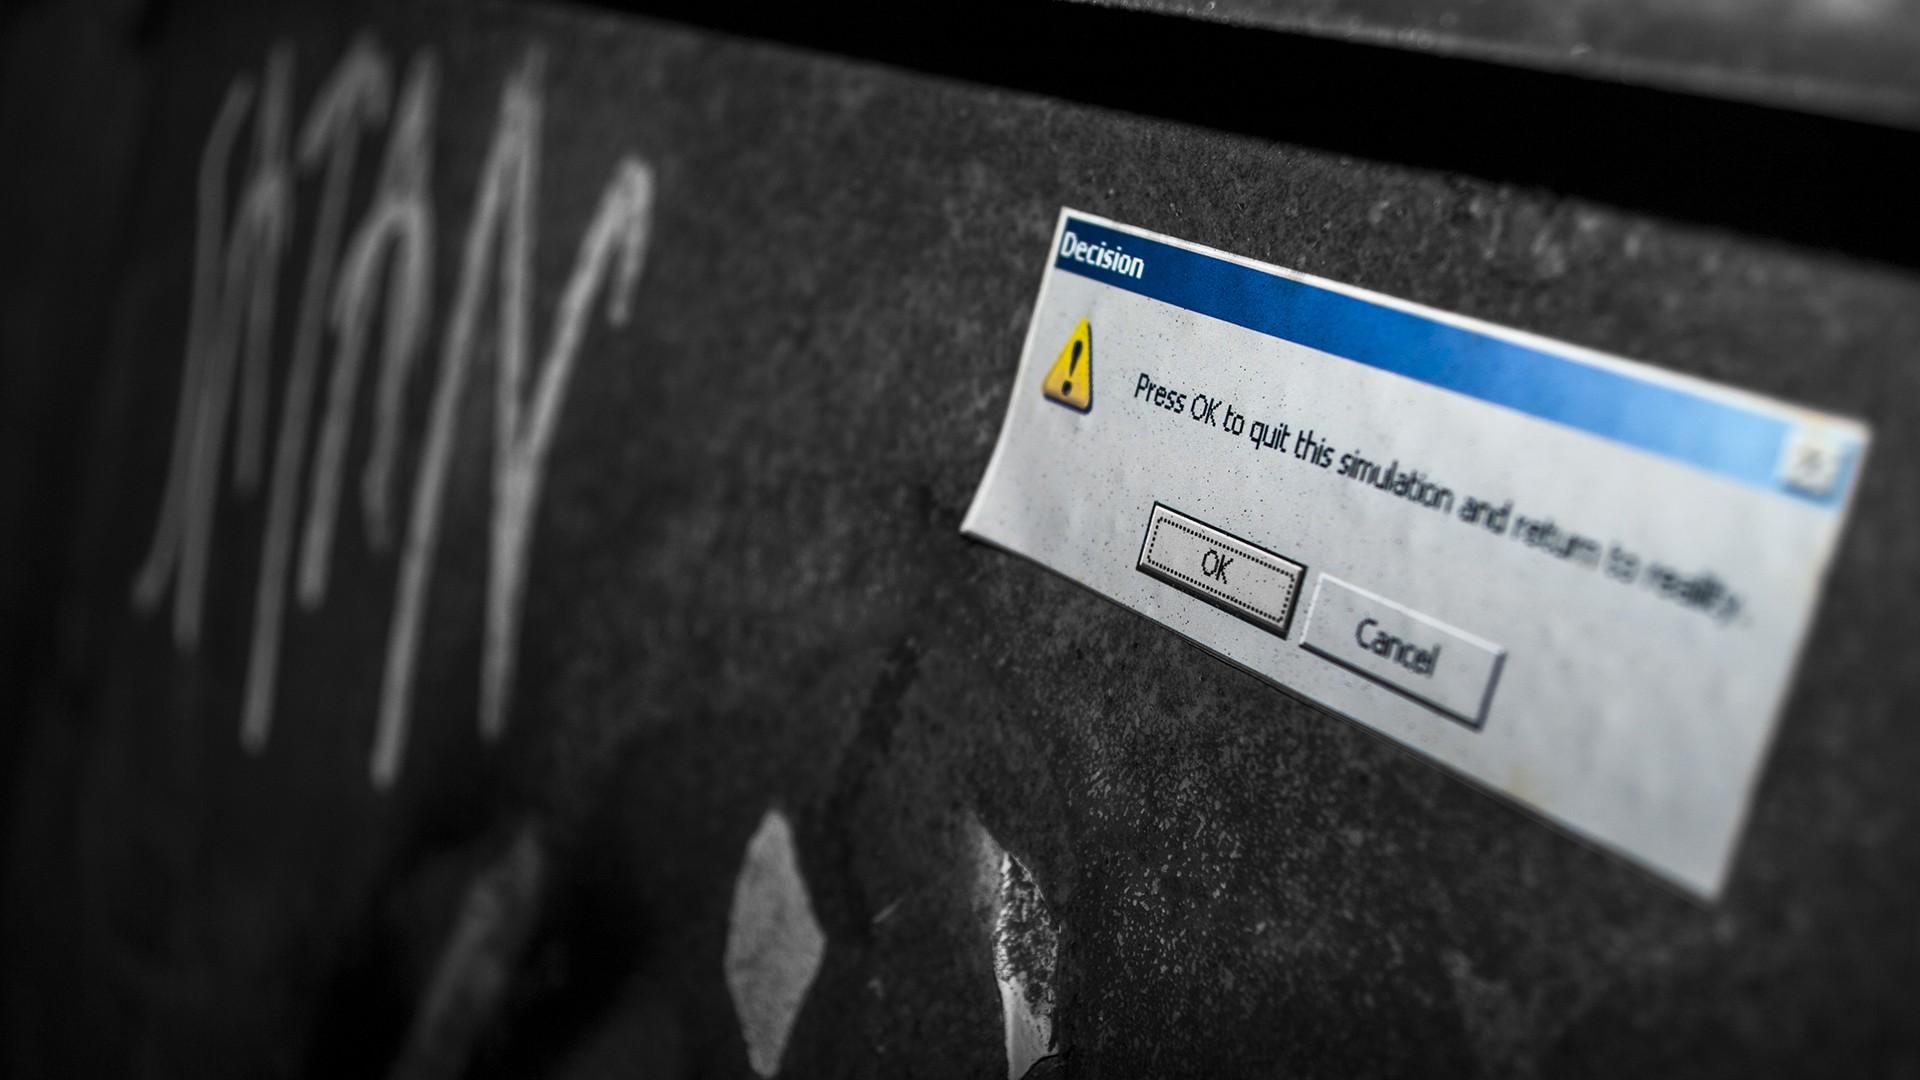 artwork-error-message-illusion-reality-windows